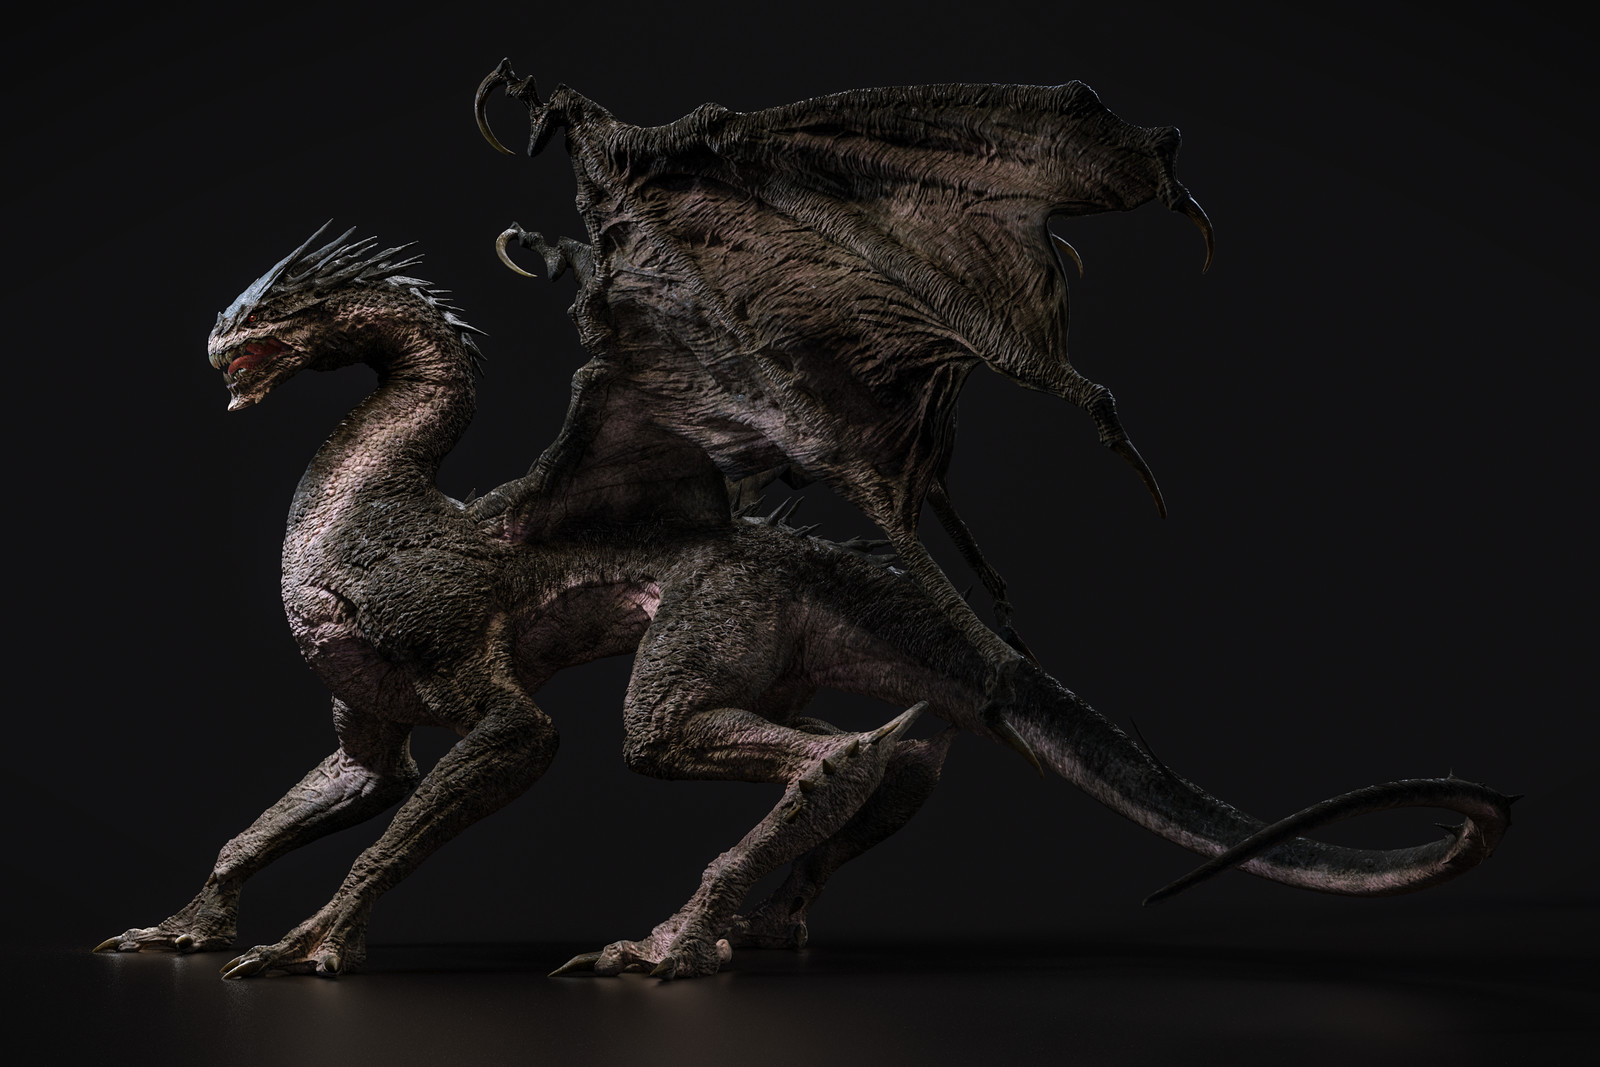 Wrath, a Personal Dragon